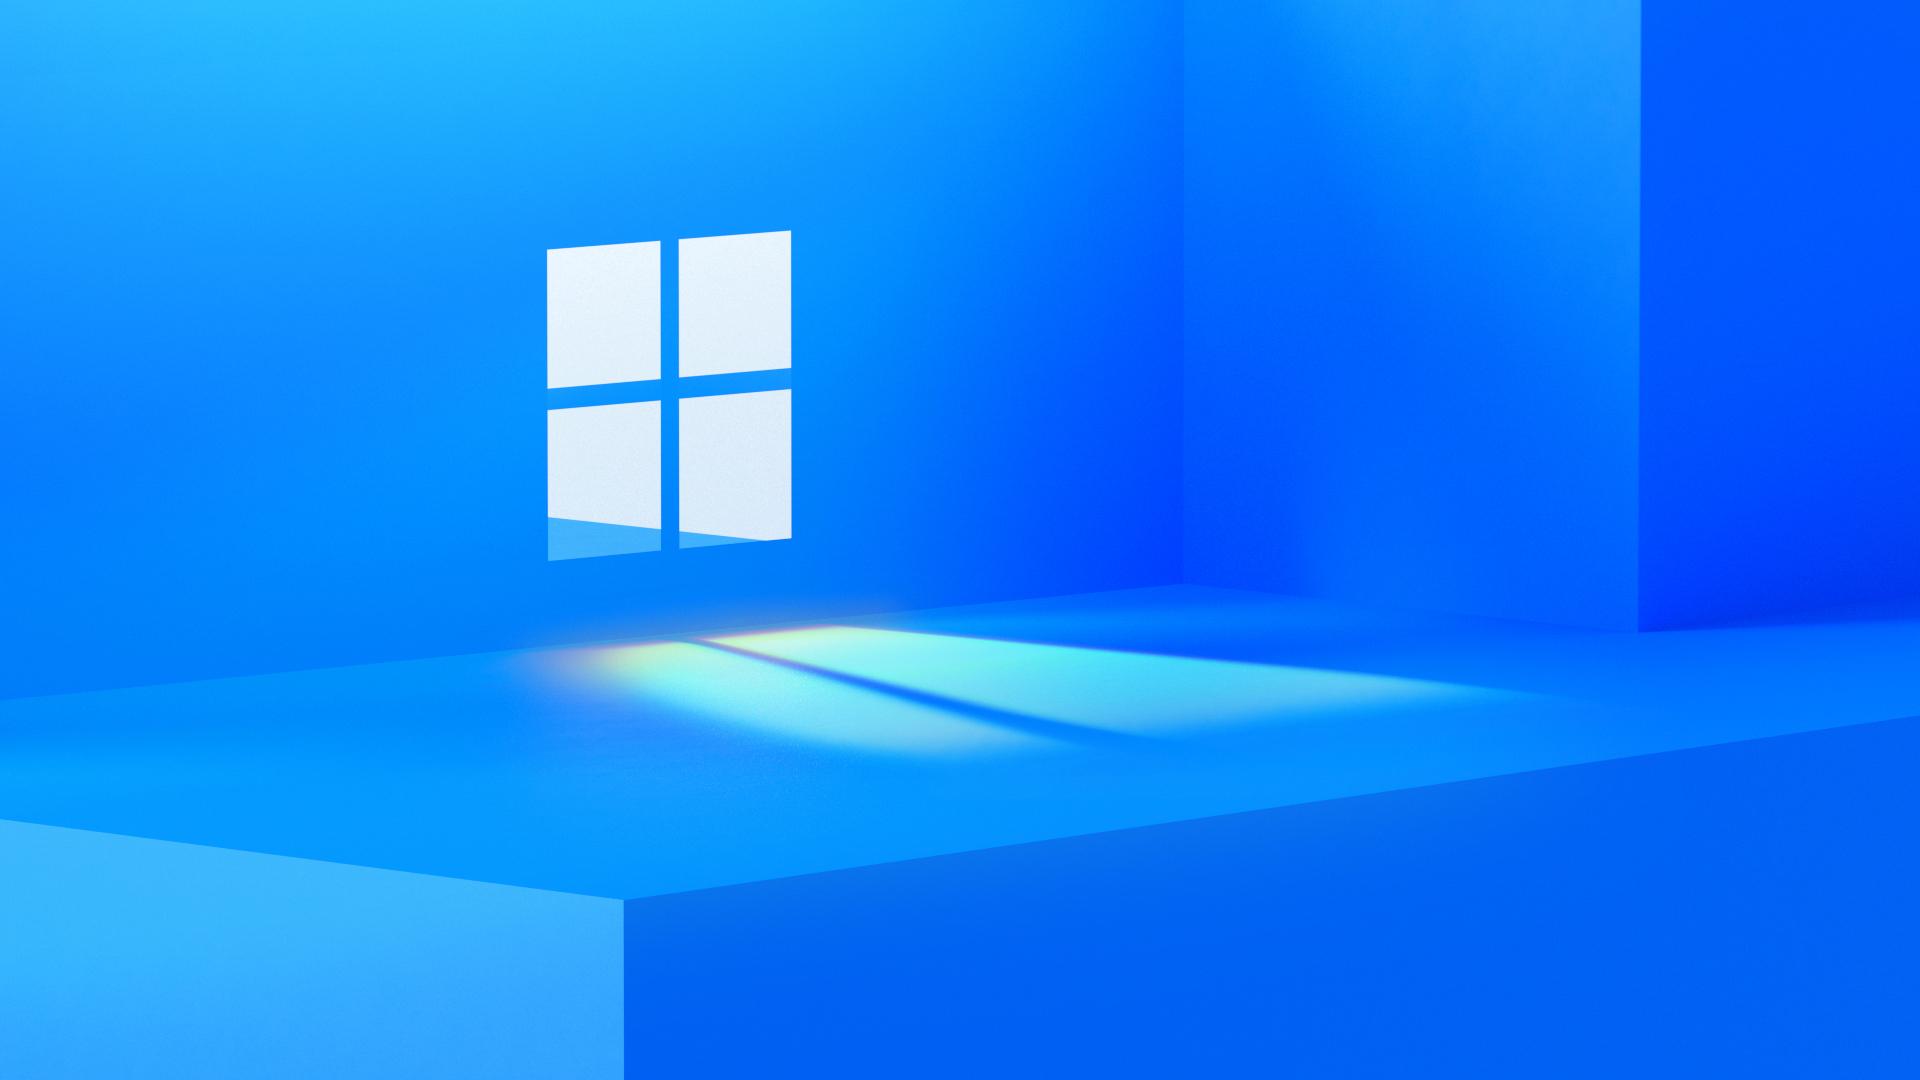 Windows 11 leak reveals similarities to Windows 10X design